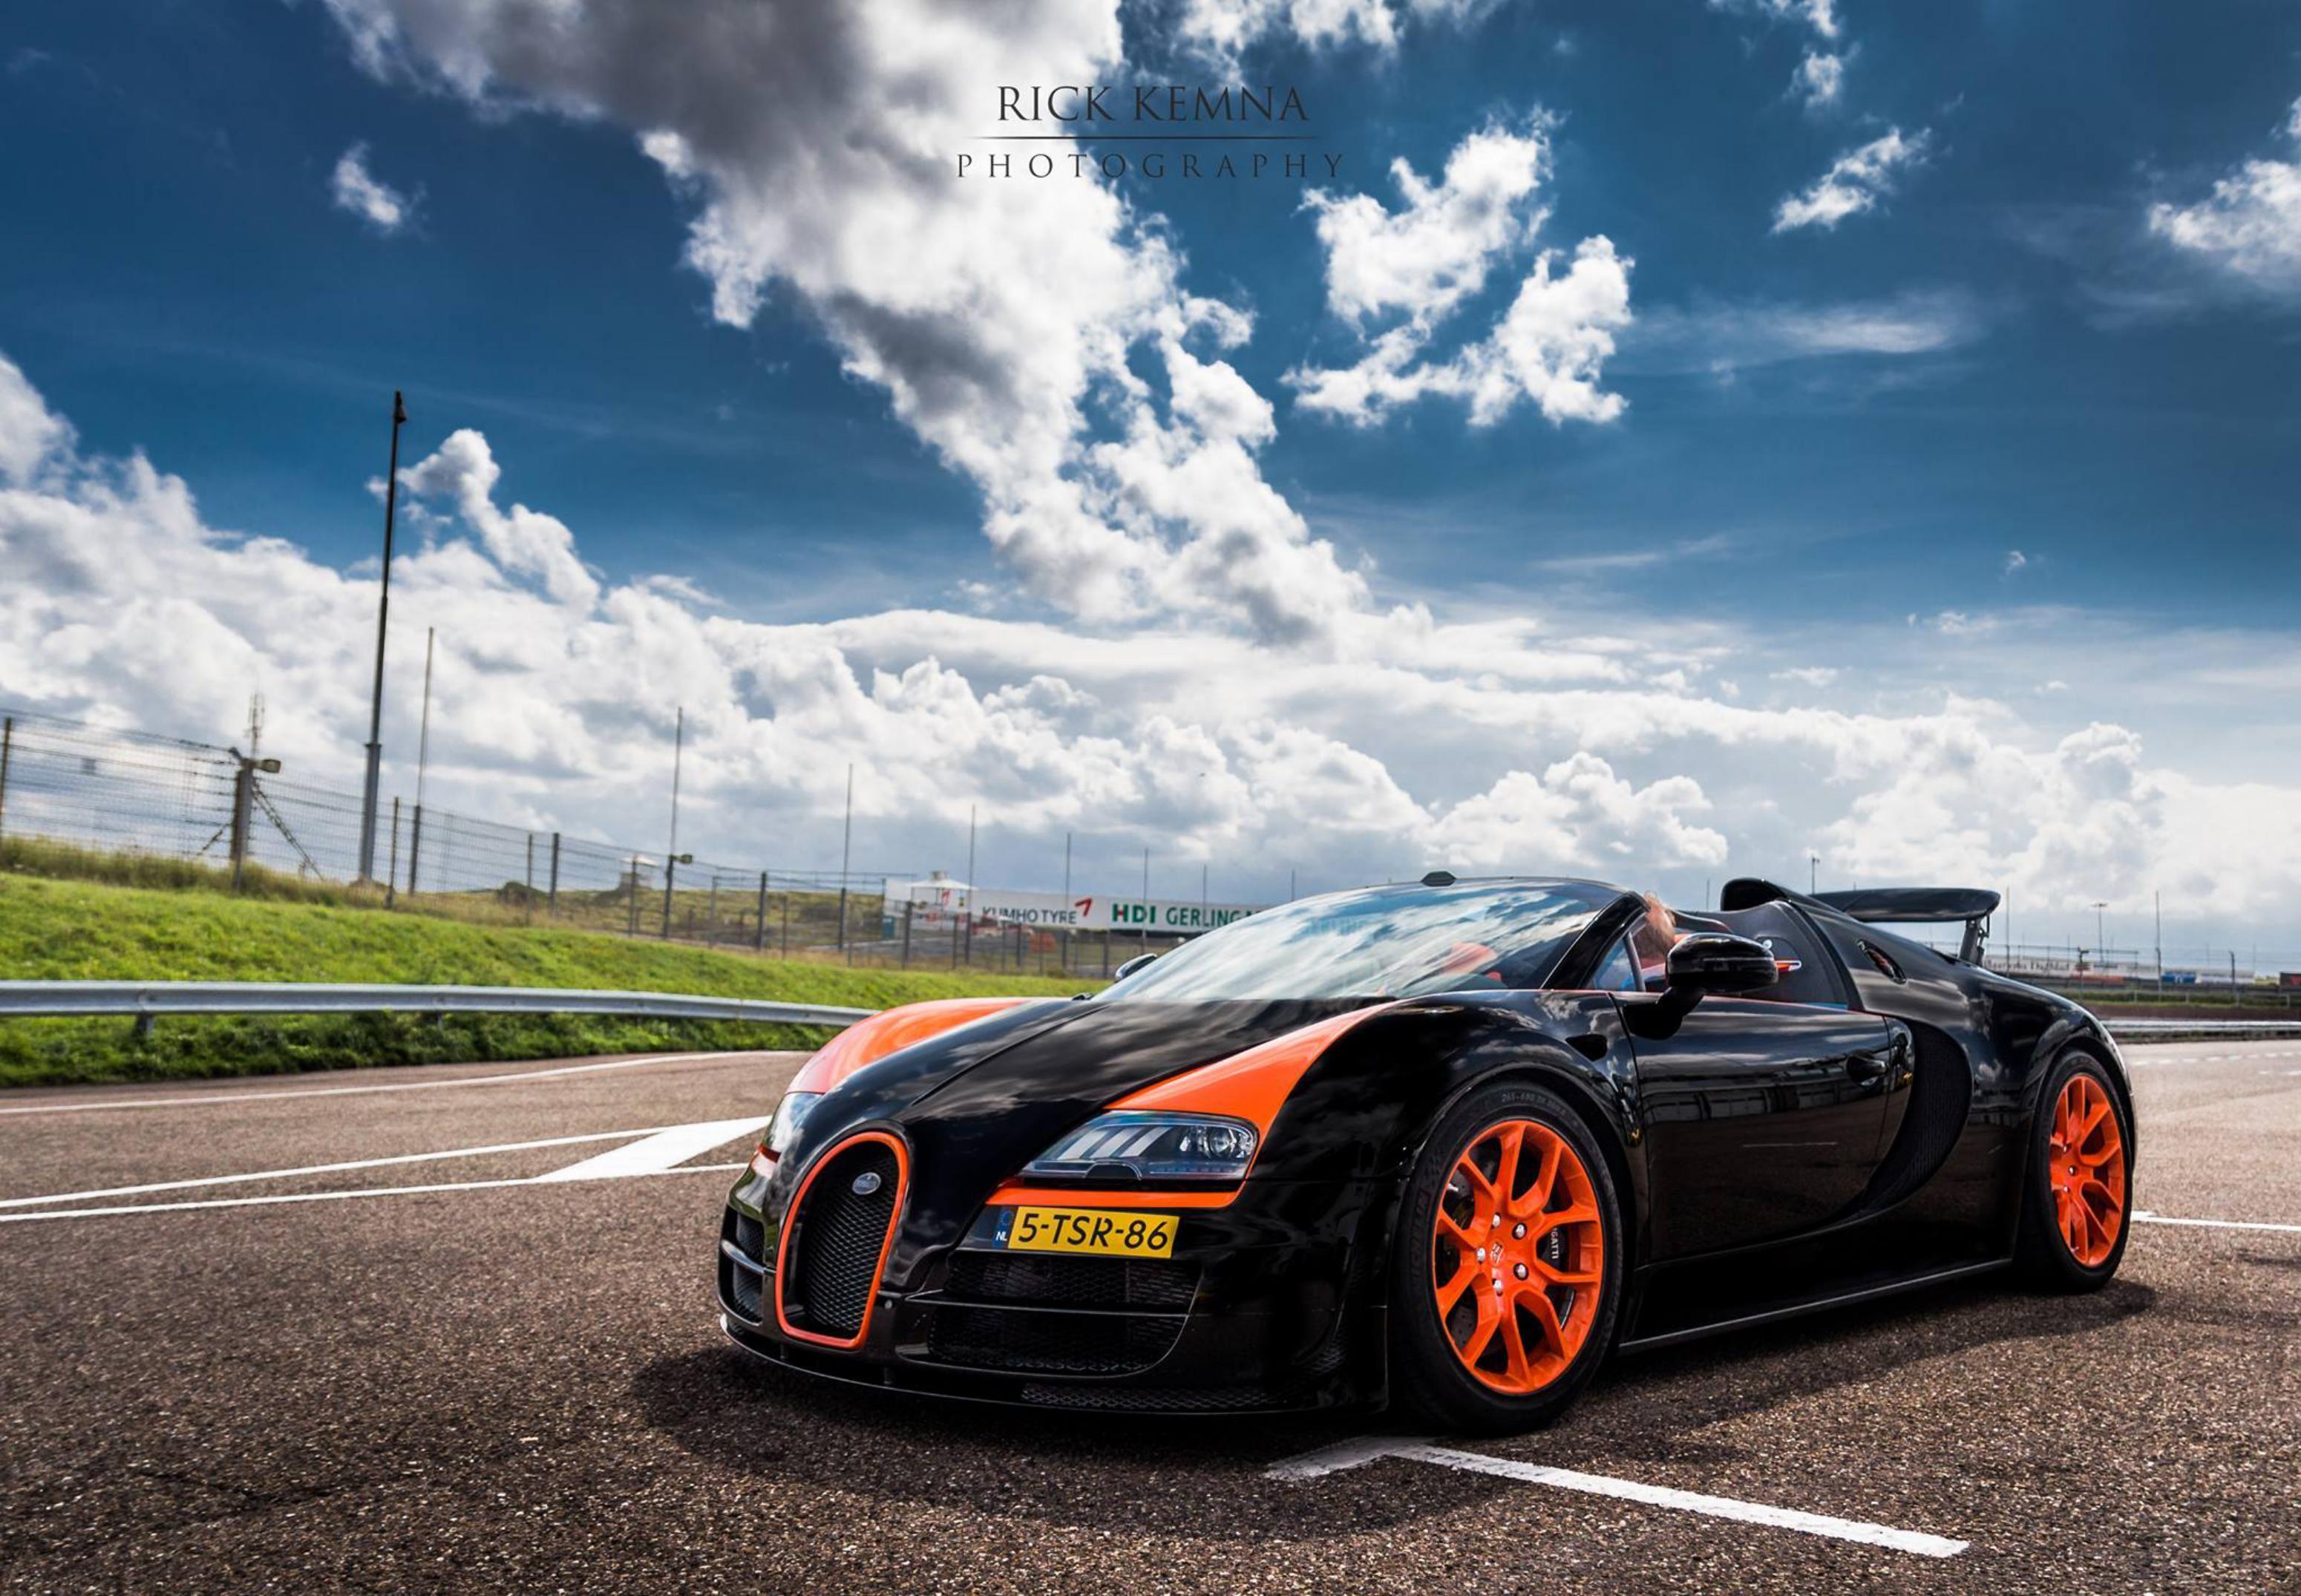 Review 2013 Bugatti Veyron Grand Sport Vitesse Wrc Bugatti Veyron Grand Sport Vitesse Super Car Bugatti Bugatti Veyron